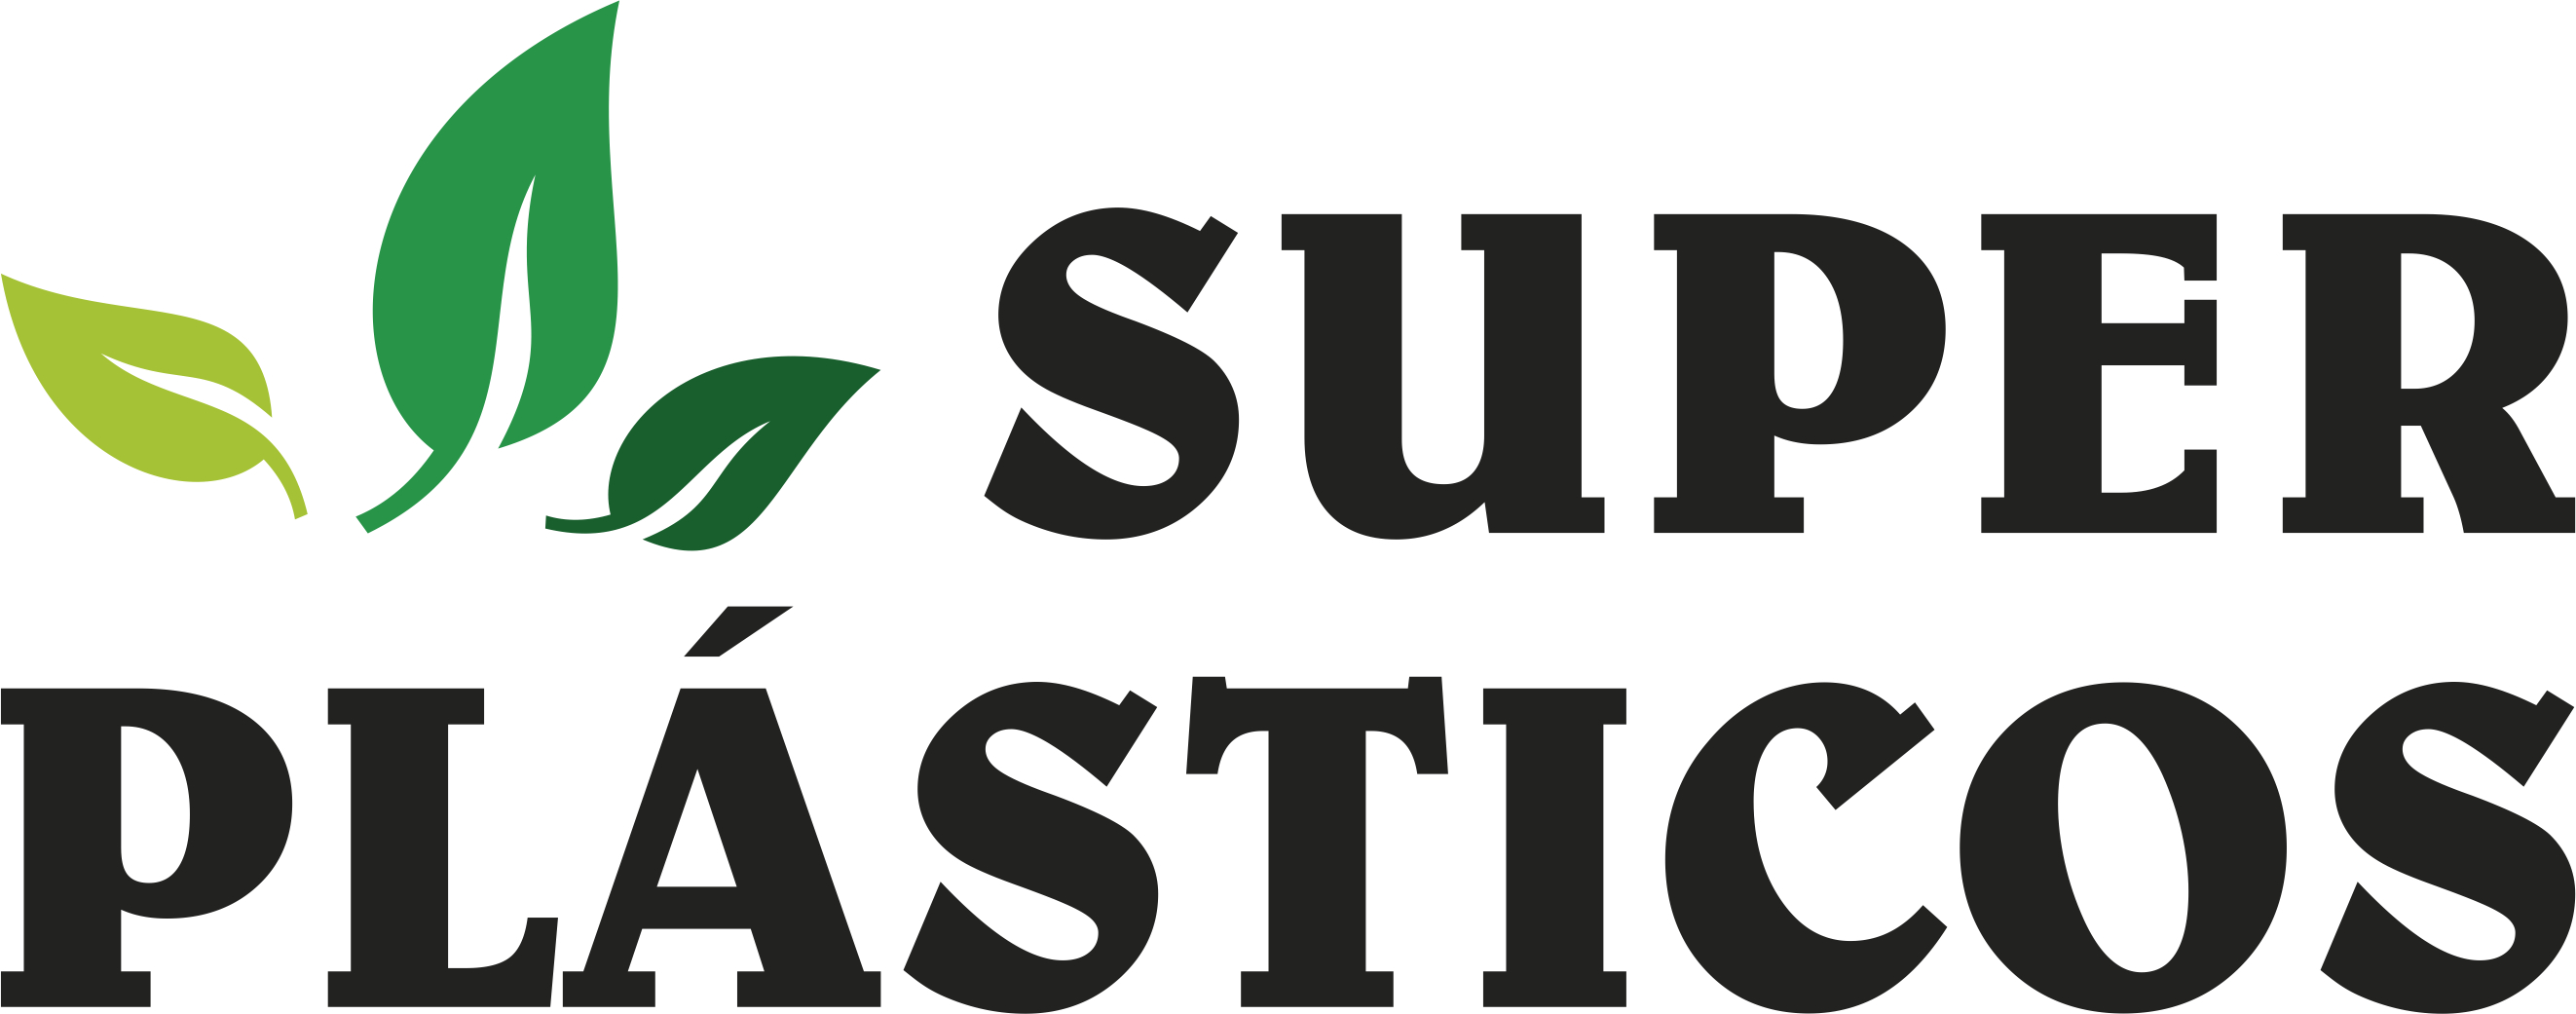 logo - super plasticos